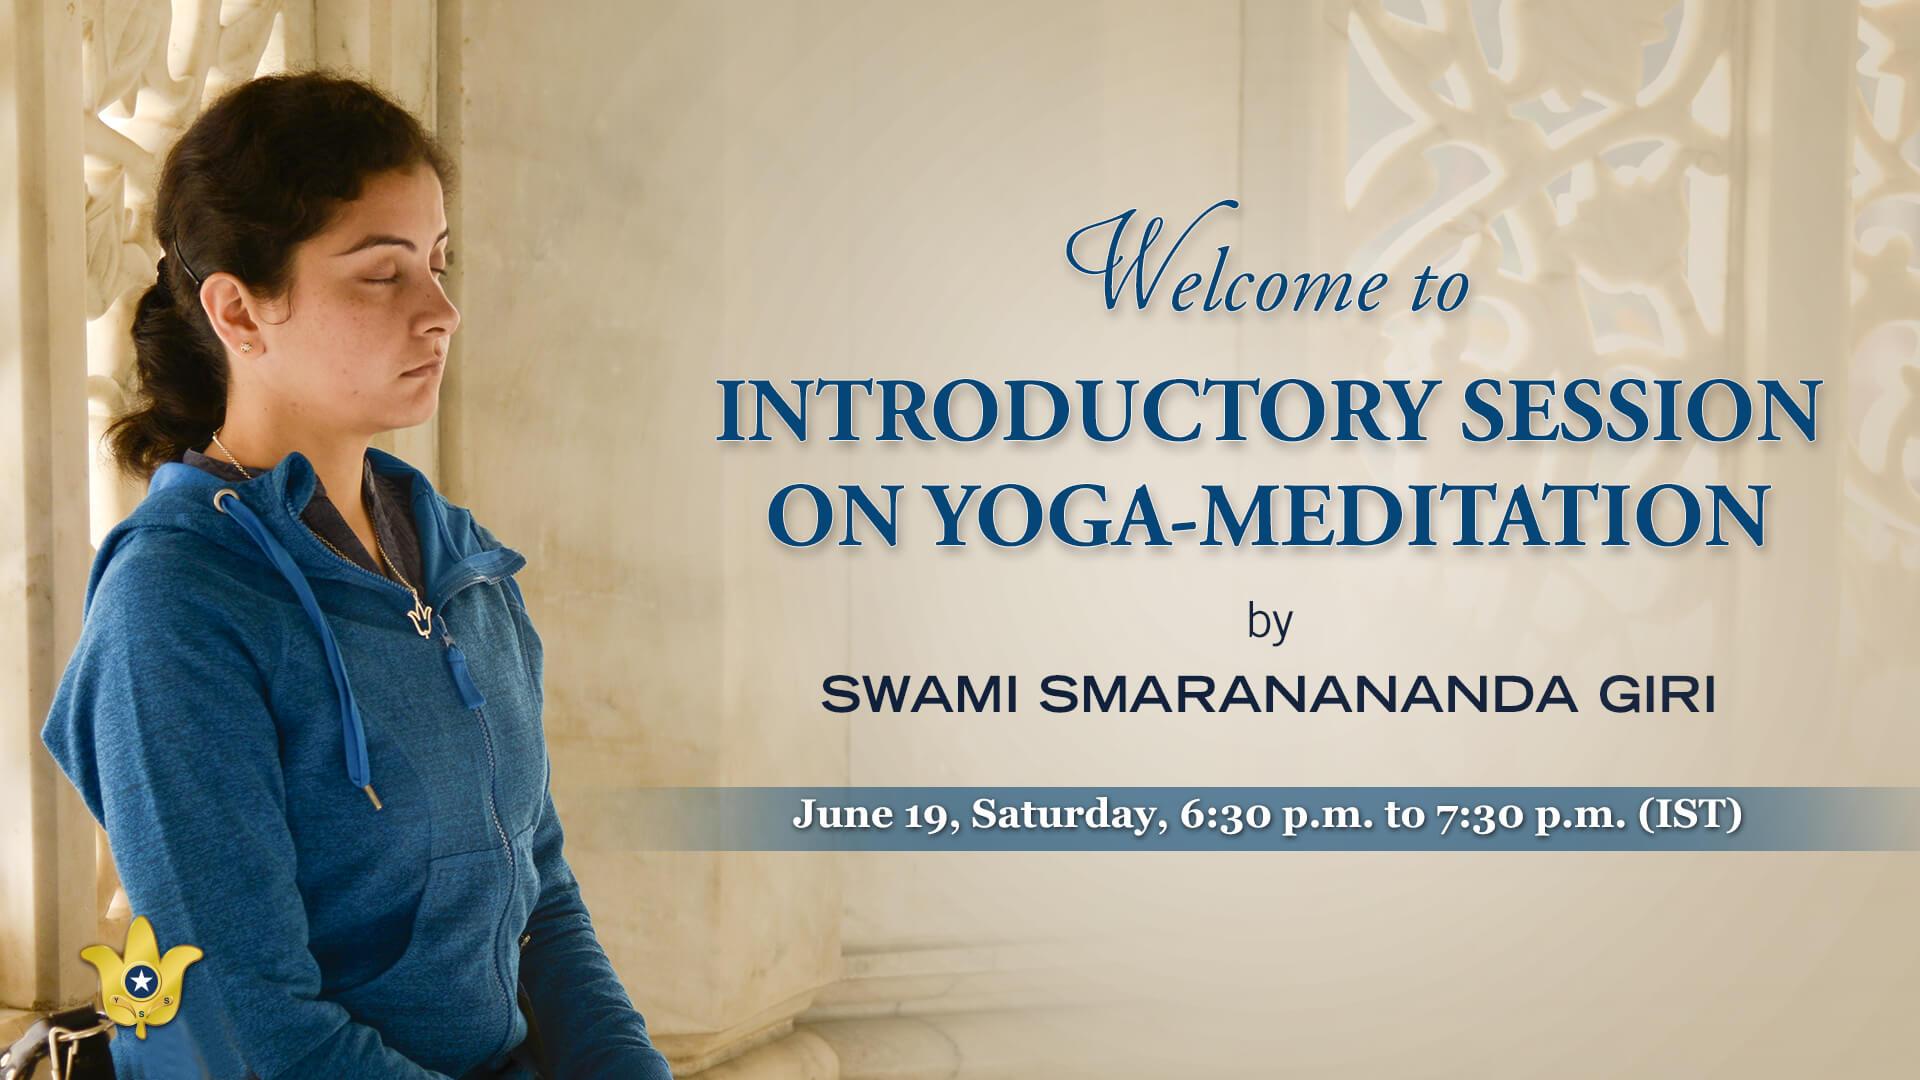 Introductory-Session-on-Yoga-Meditation